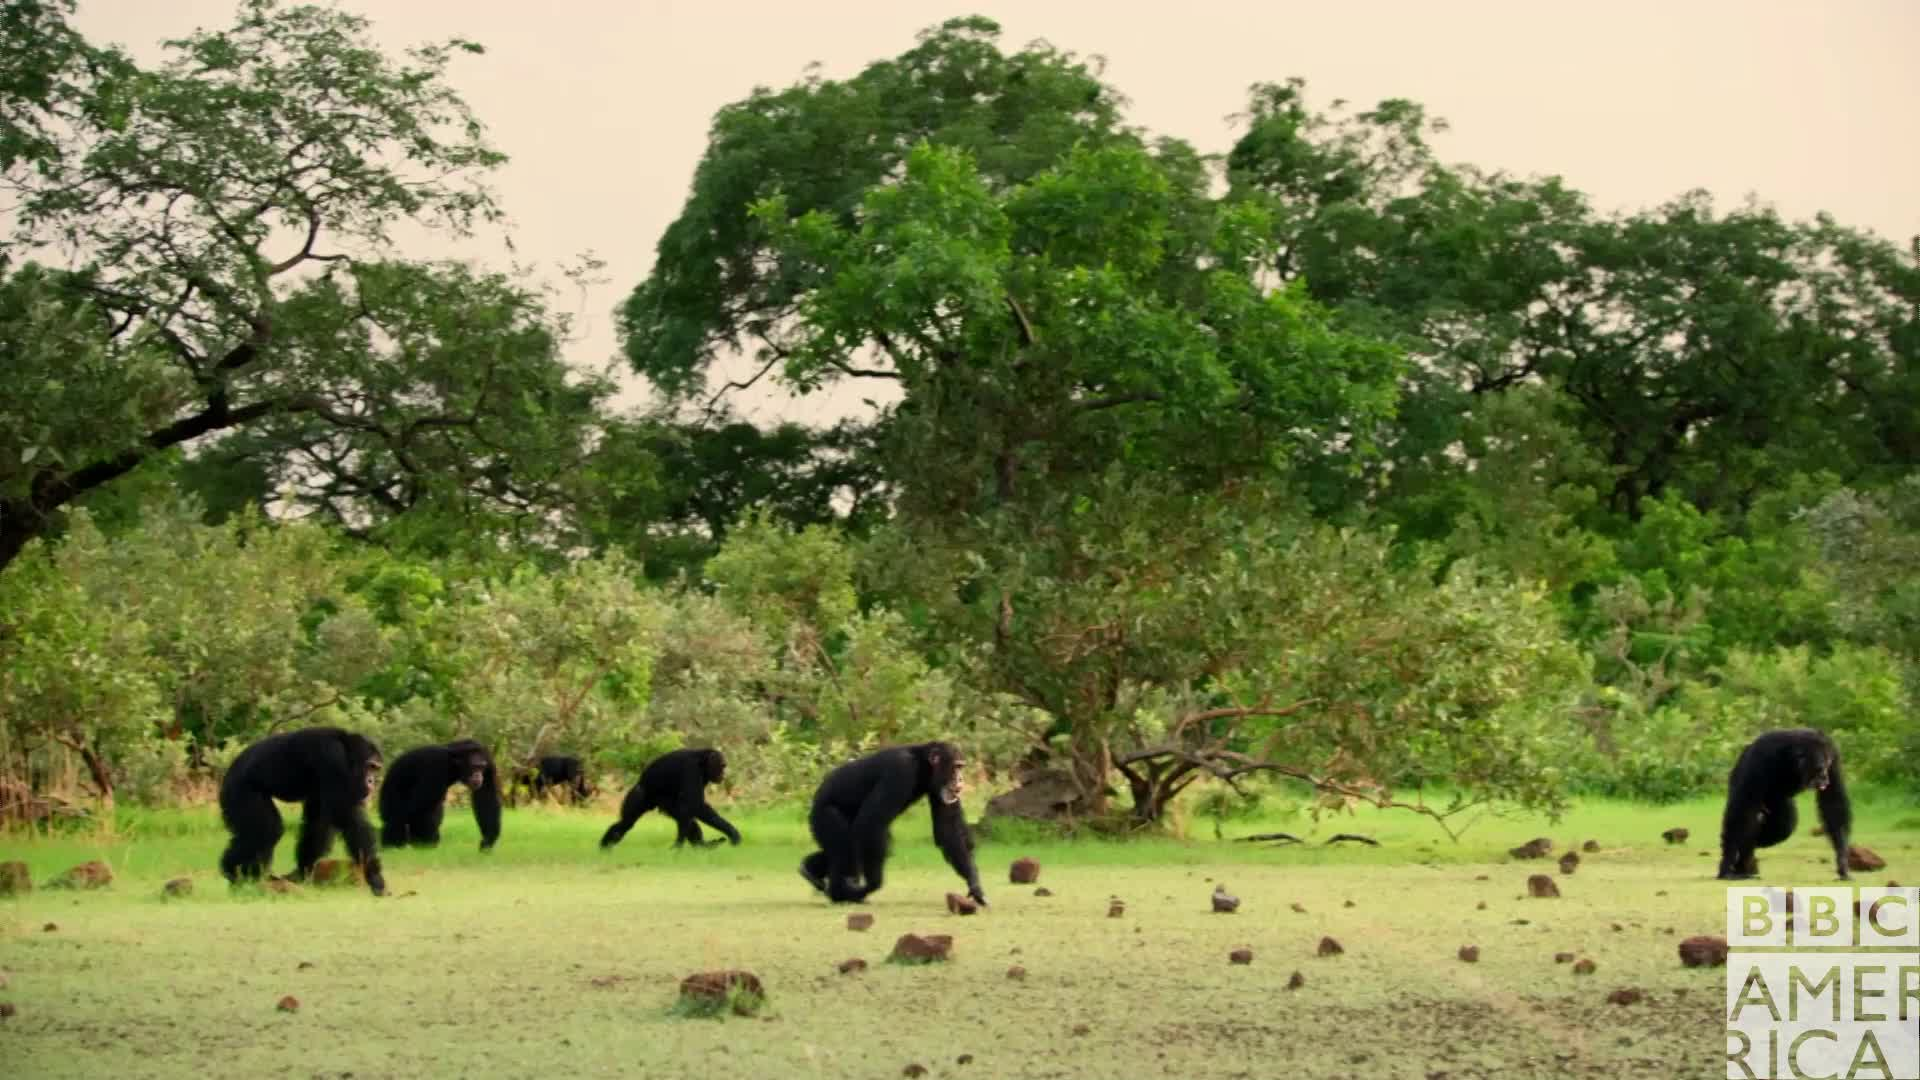 animal, animals, bbc america, bbc america dynasties, bbc america: dynasties, chimp, chimpanzee, chimpanzees, chimps, dynasties, Dynasties Chimp Swag GIFs